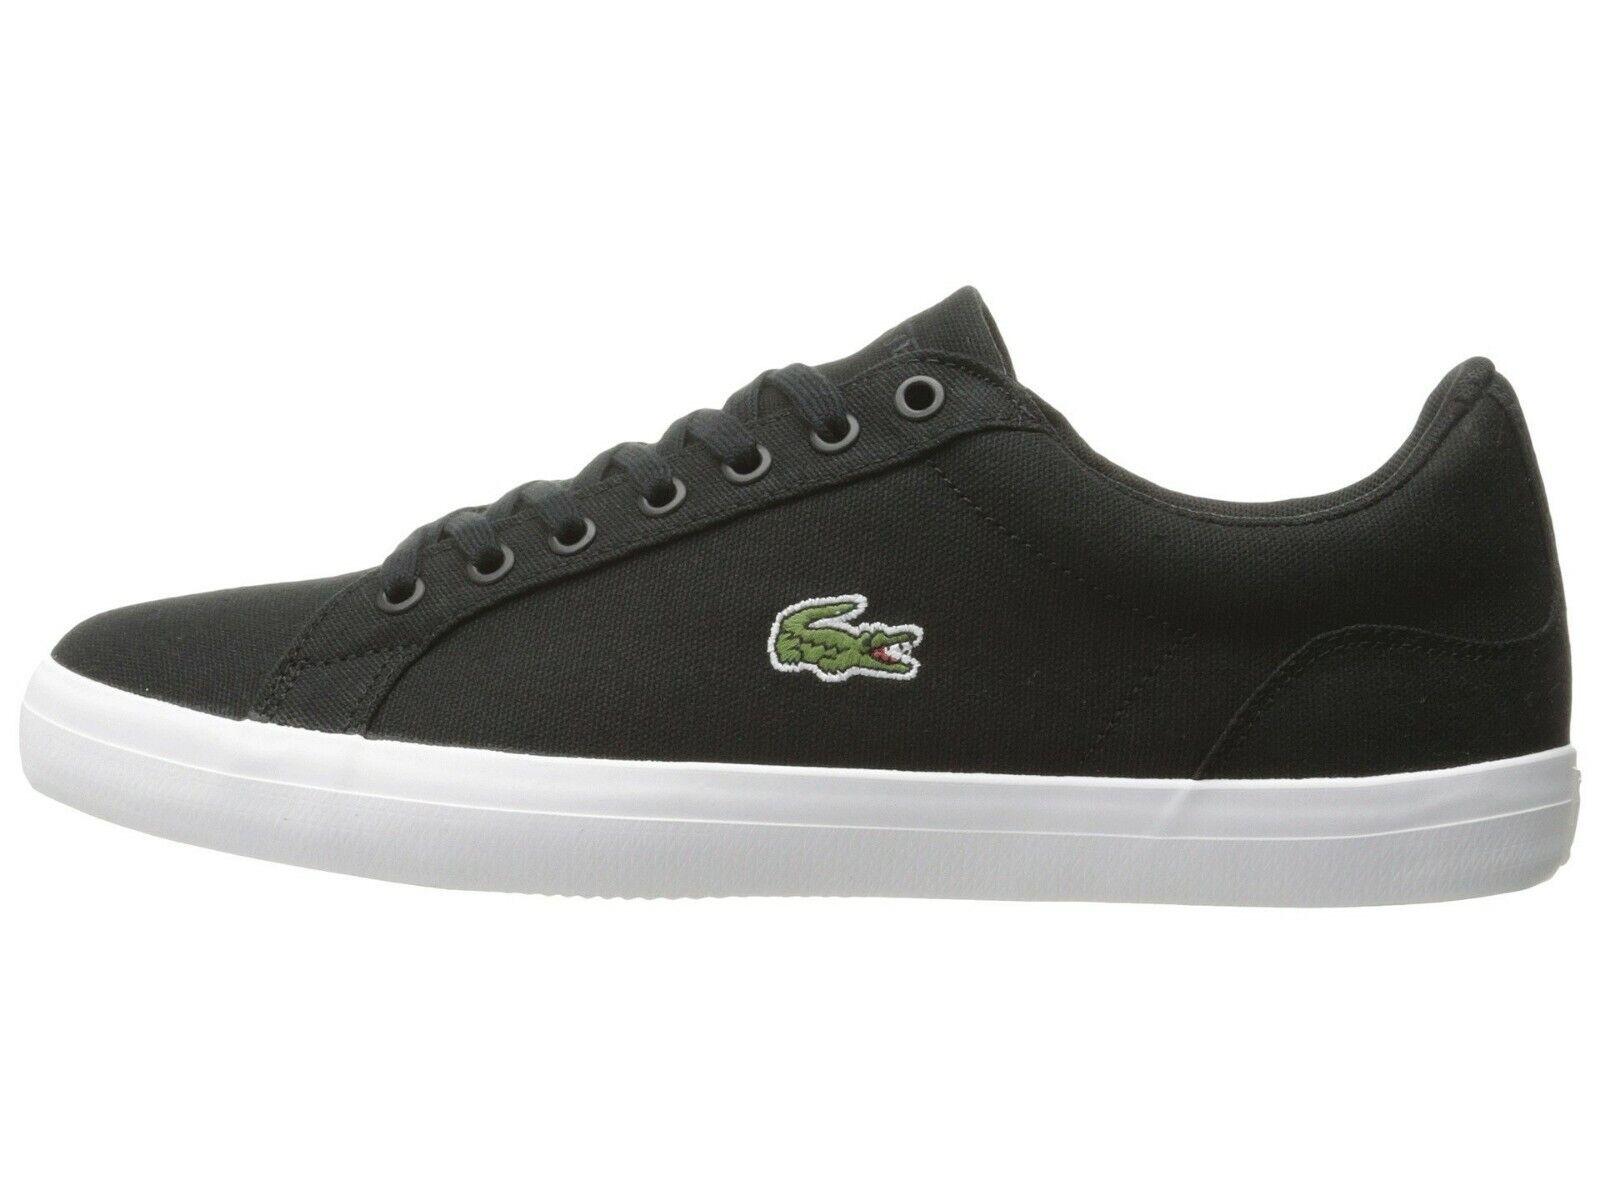 LACOSTE Lerond BL 2 Men's Croc Logo Casual Slip On Loafer shoes Sneakers Black